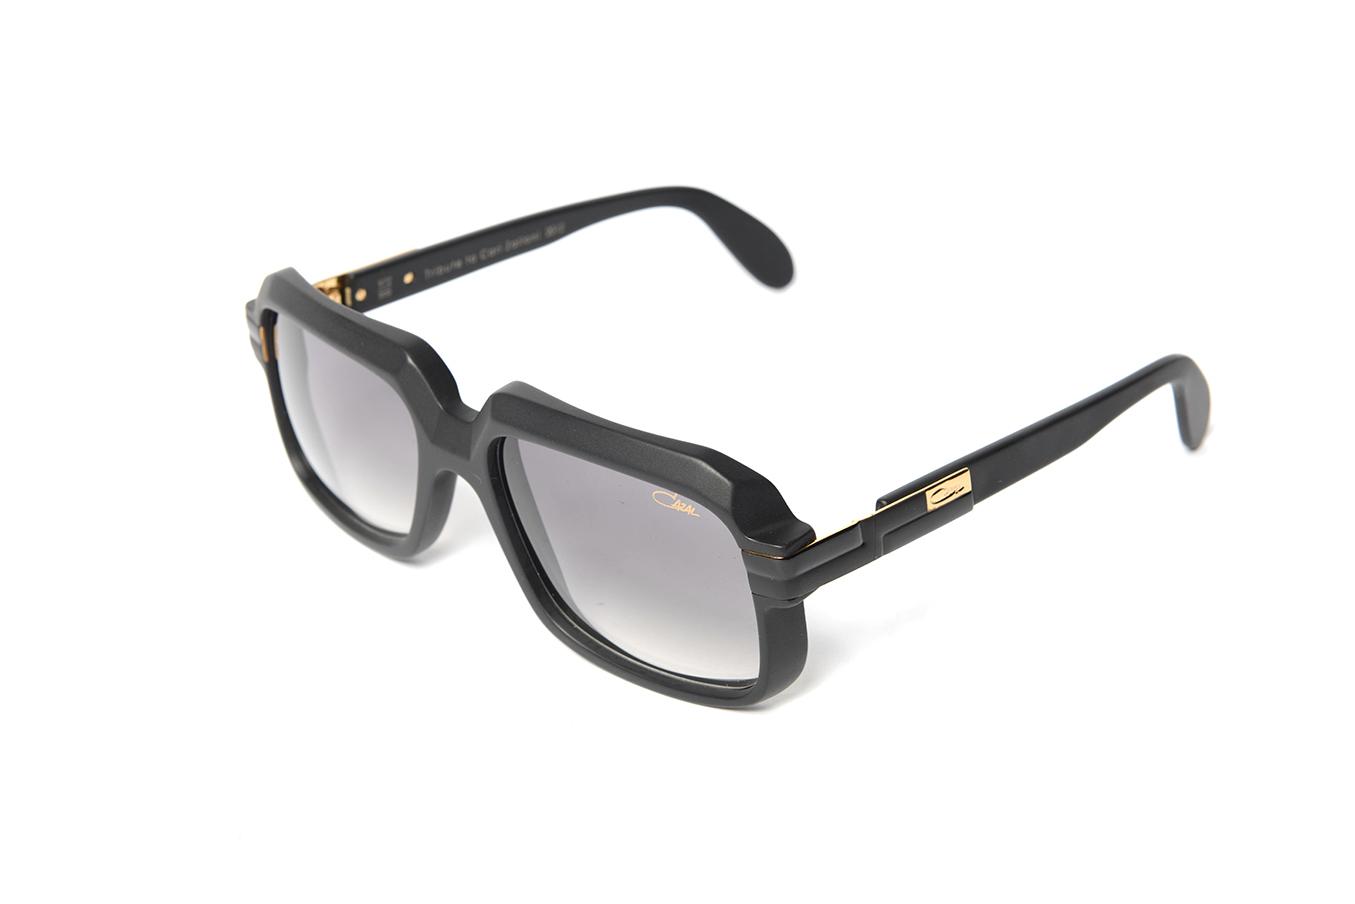 ee5ddc80965 Cazal 607 301 Ltd Edition Sunglasses - Piccadilly Opticians -